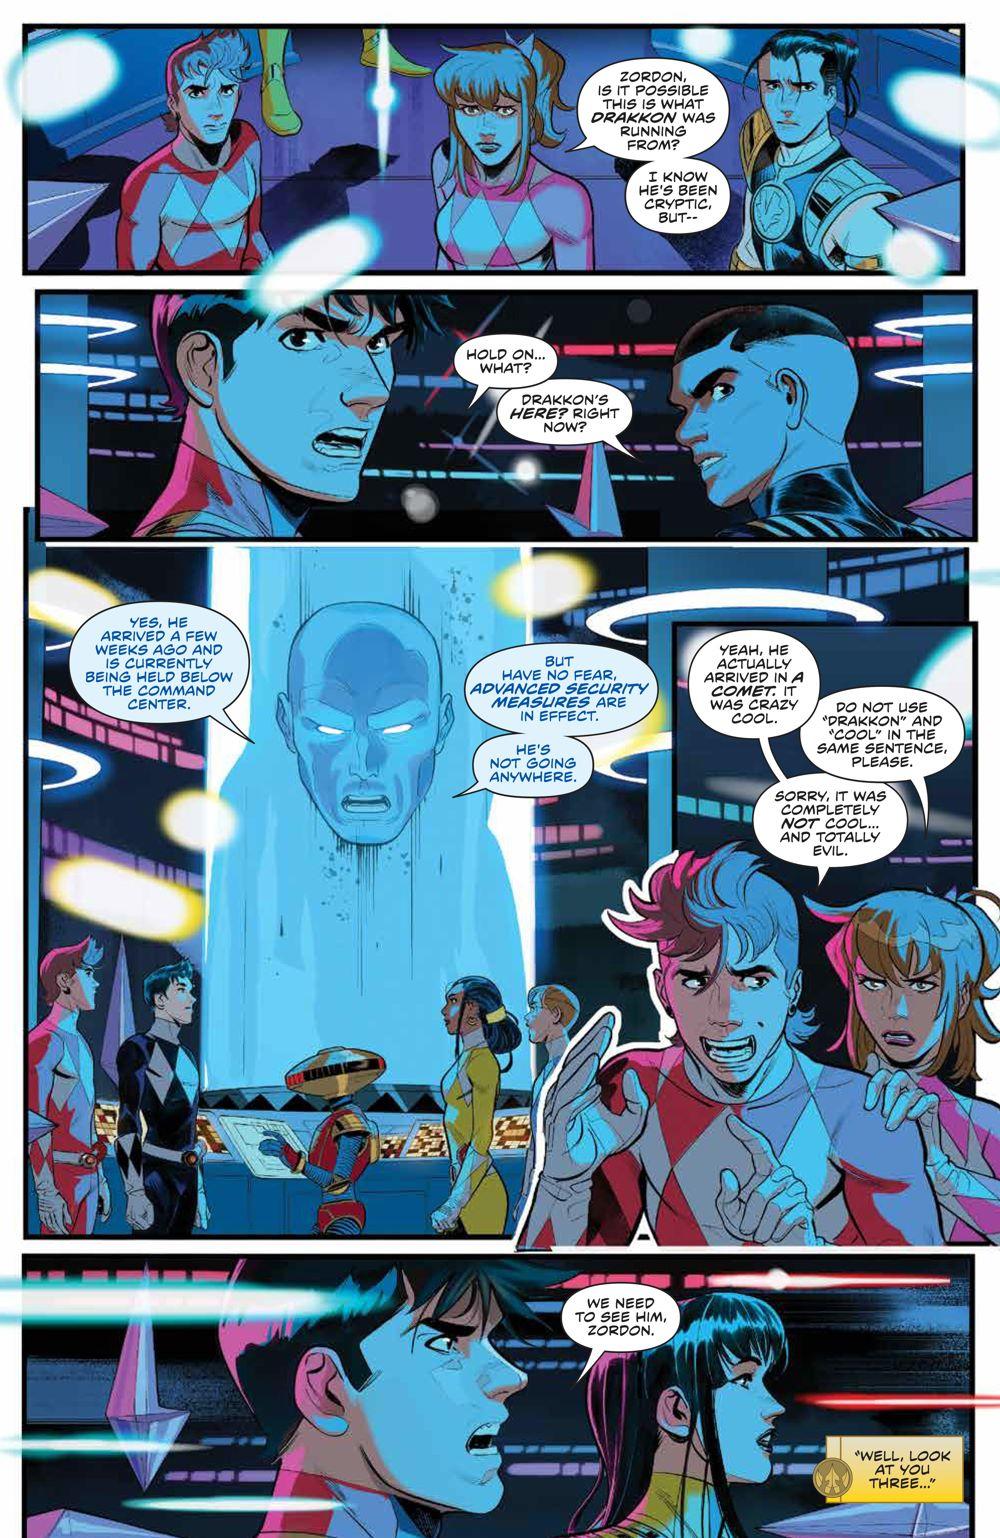 PowerRangers_v1_SC_PRESS_14 ComicList Previews: POWER RANGERS VOLUME 1 TP